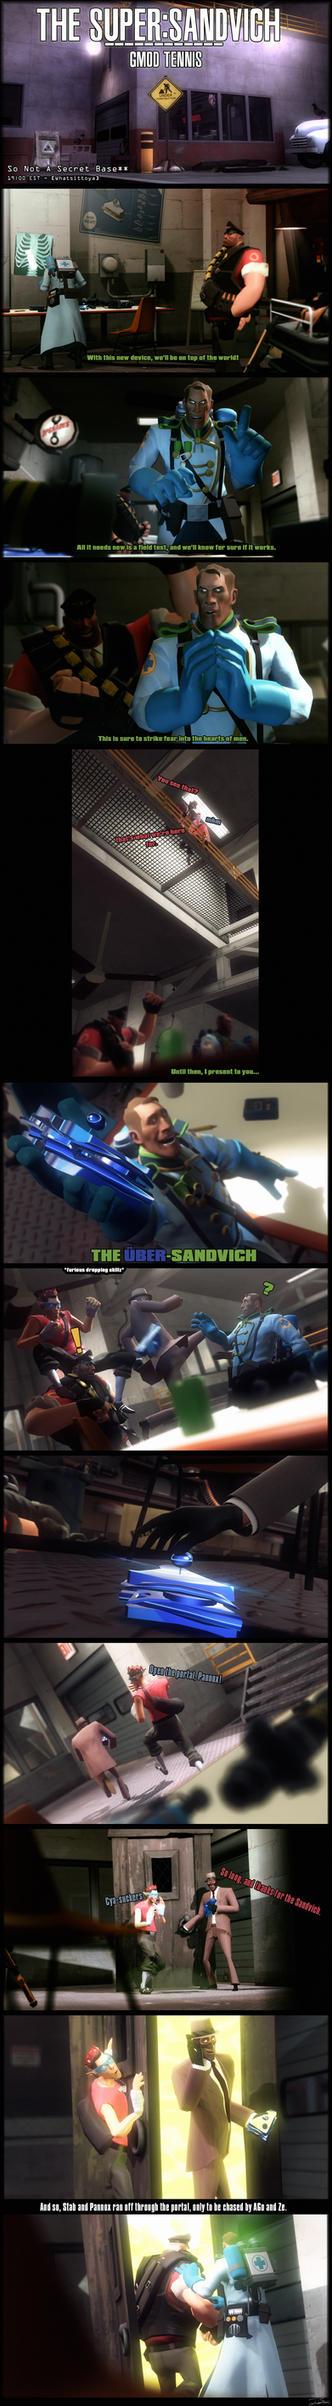 [GMOD TENNIS] The Super:Sandvich by ZeUberMedicSFM